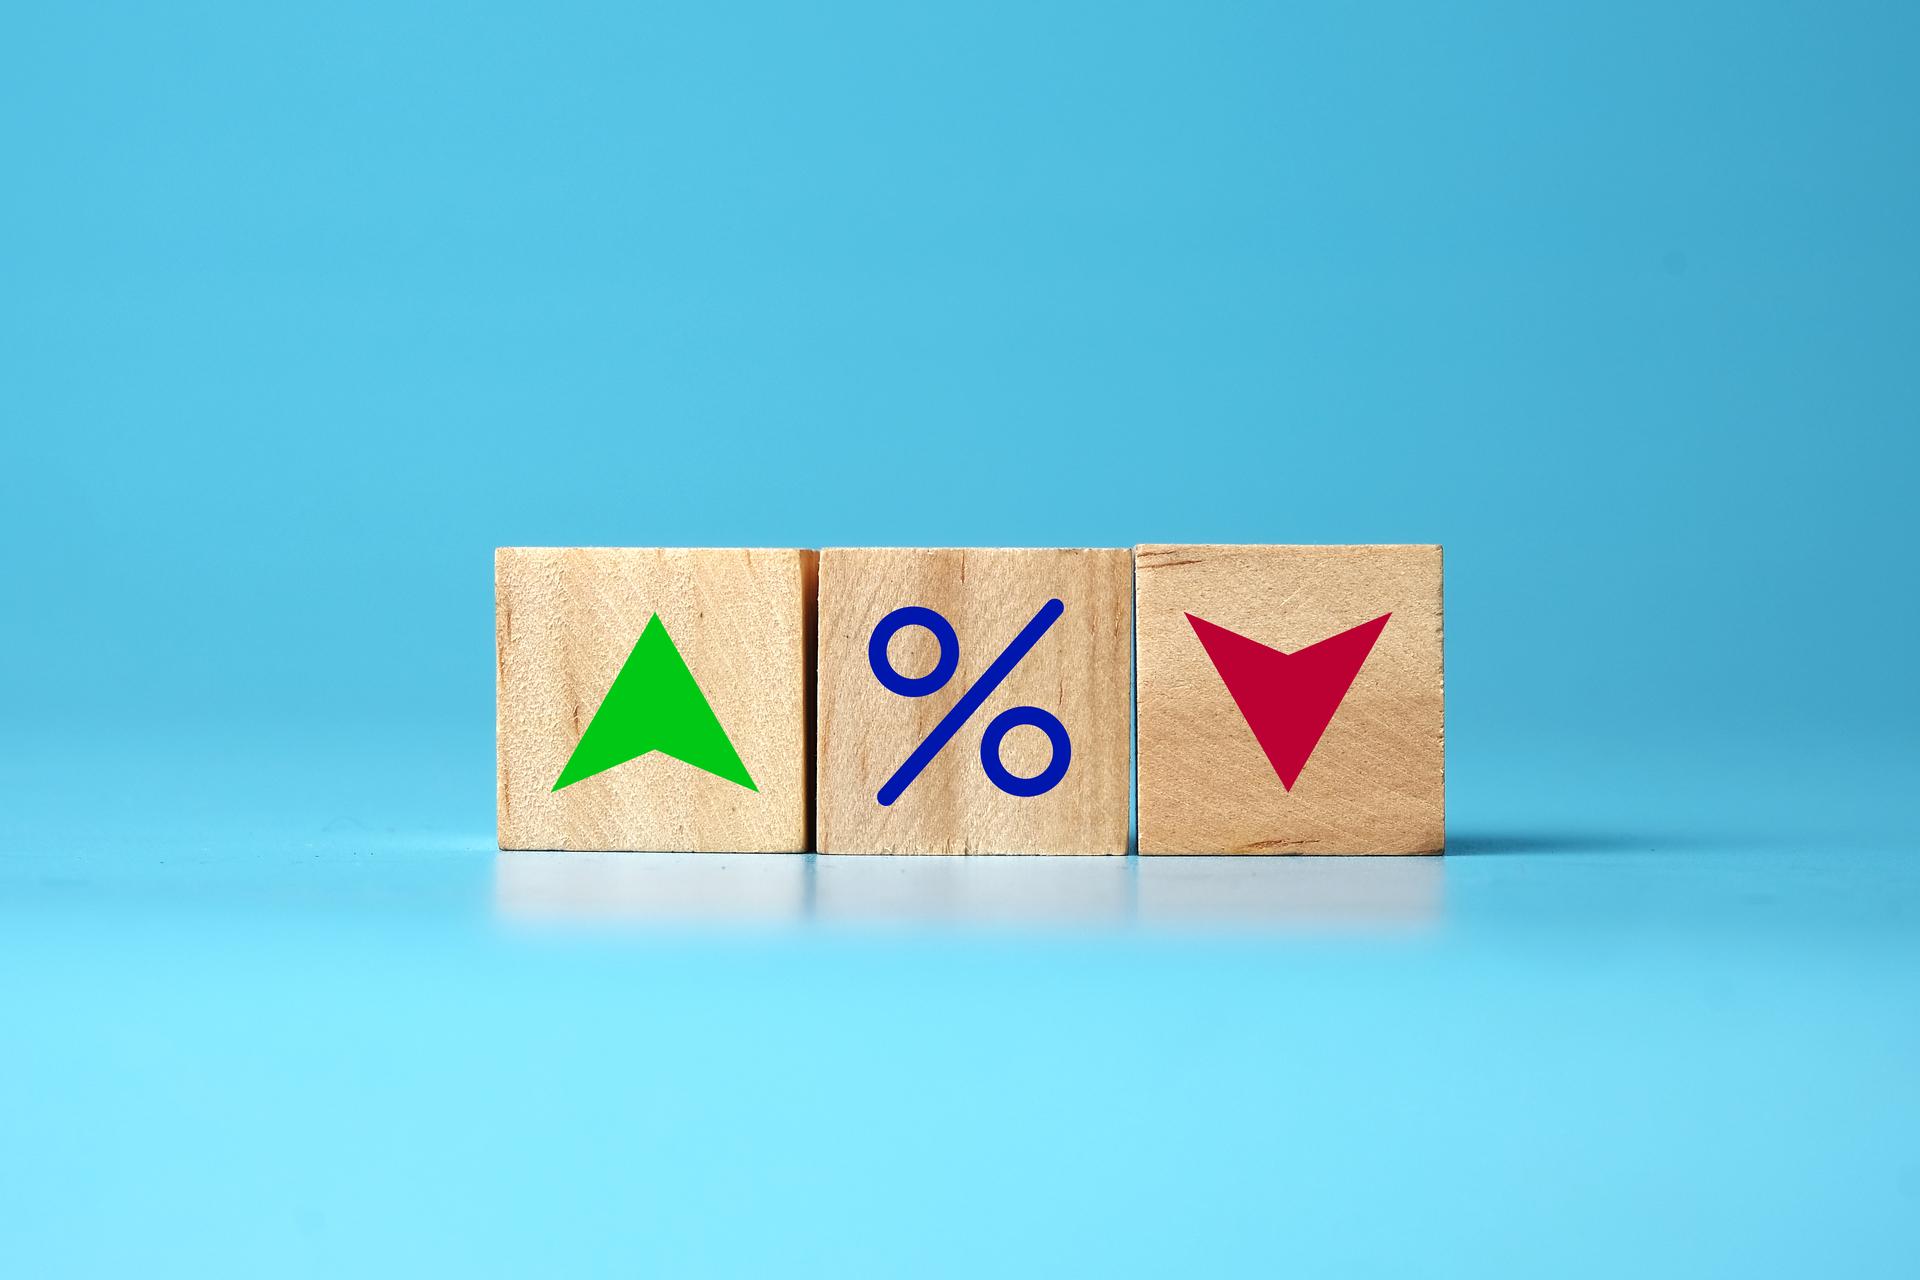 2022 Affordability Percentages Will Decrease